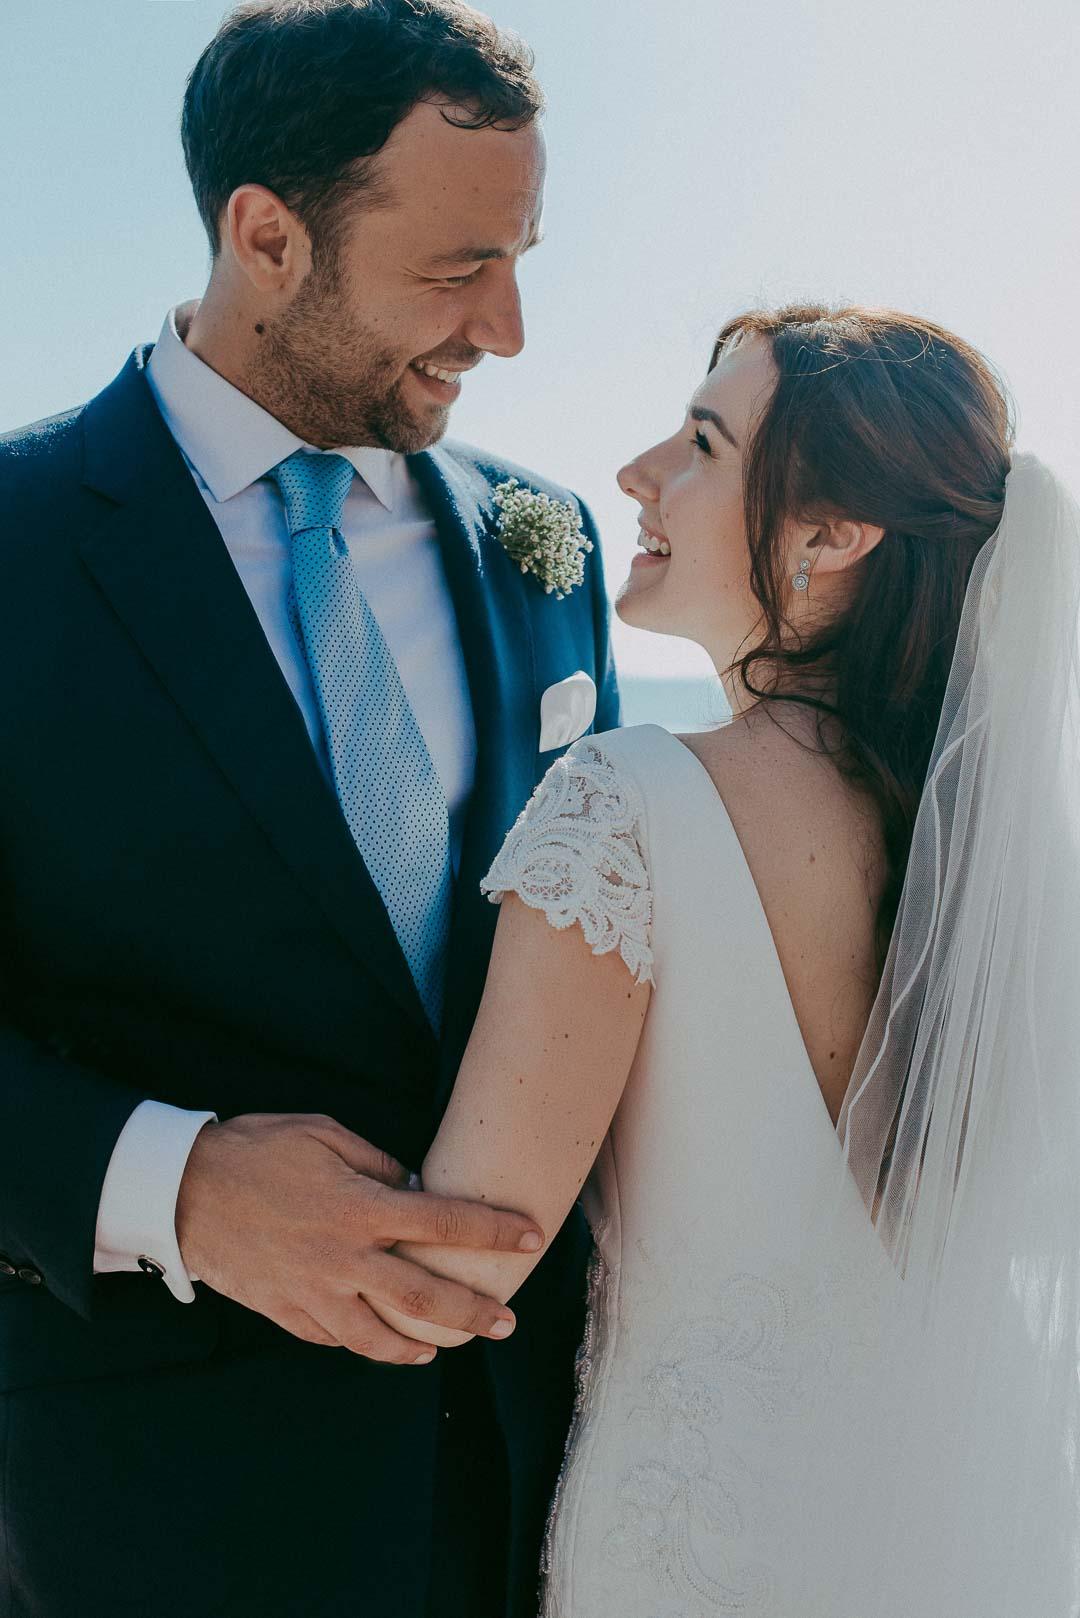 wedding-photographer-destination-fineart-bespoke-reportage-sorrento-parcodeiprincipi-vivianeizzo-spazio46-66